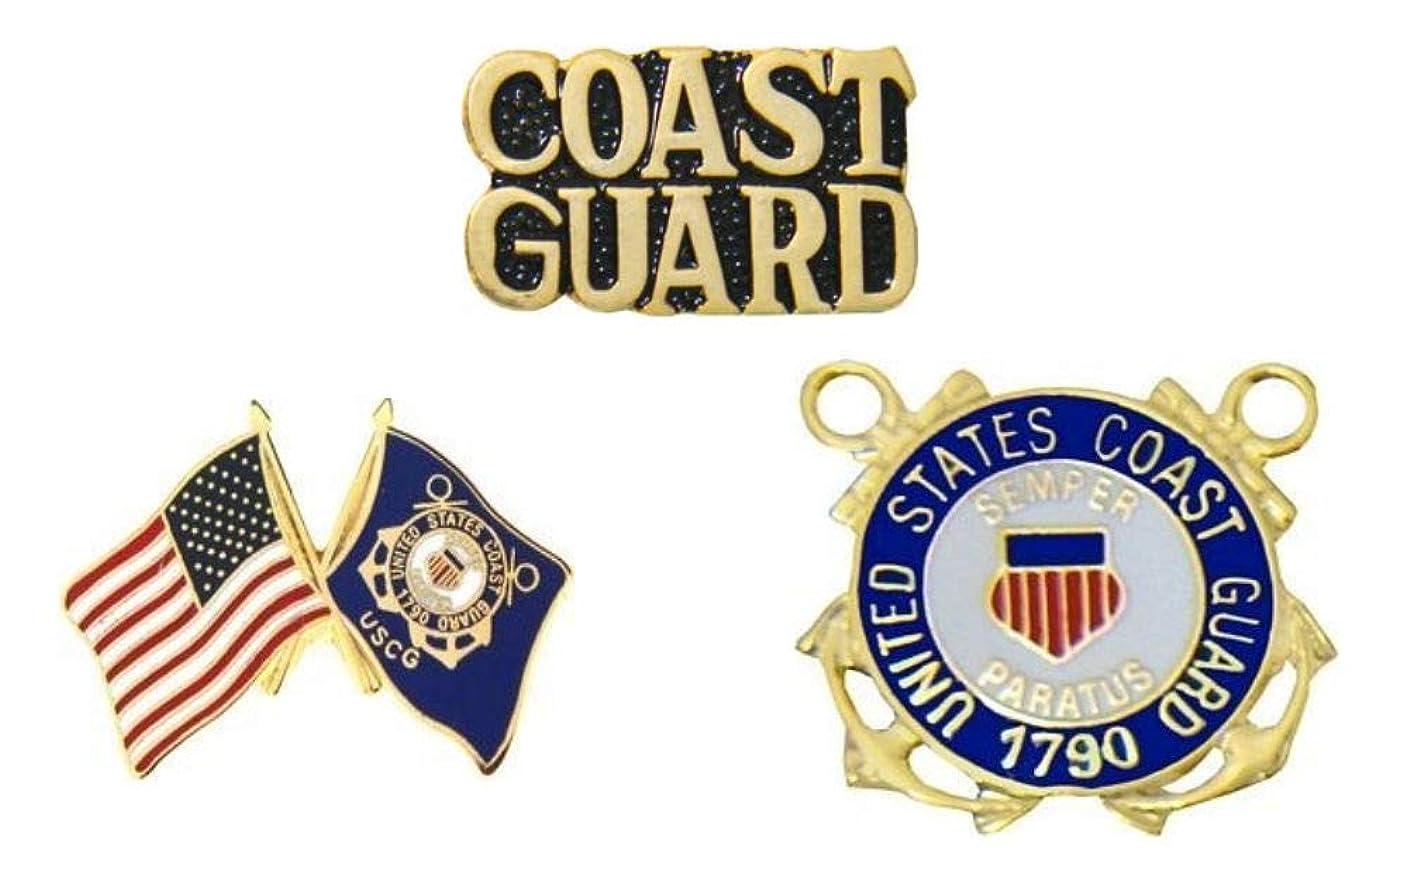 USCG U.S. Coast Guard Pins - Novelty Hat Pin 3 PACK